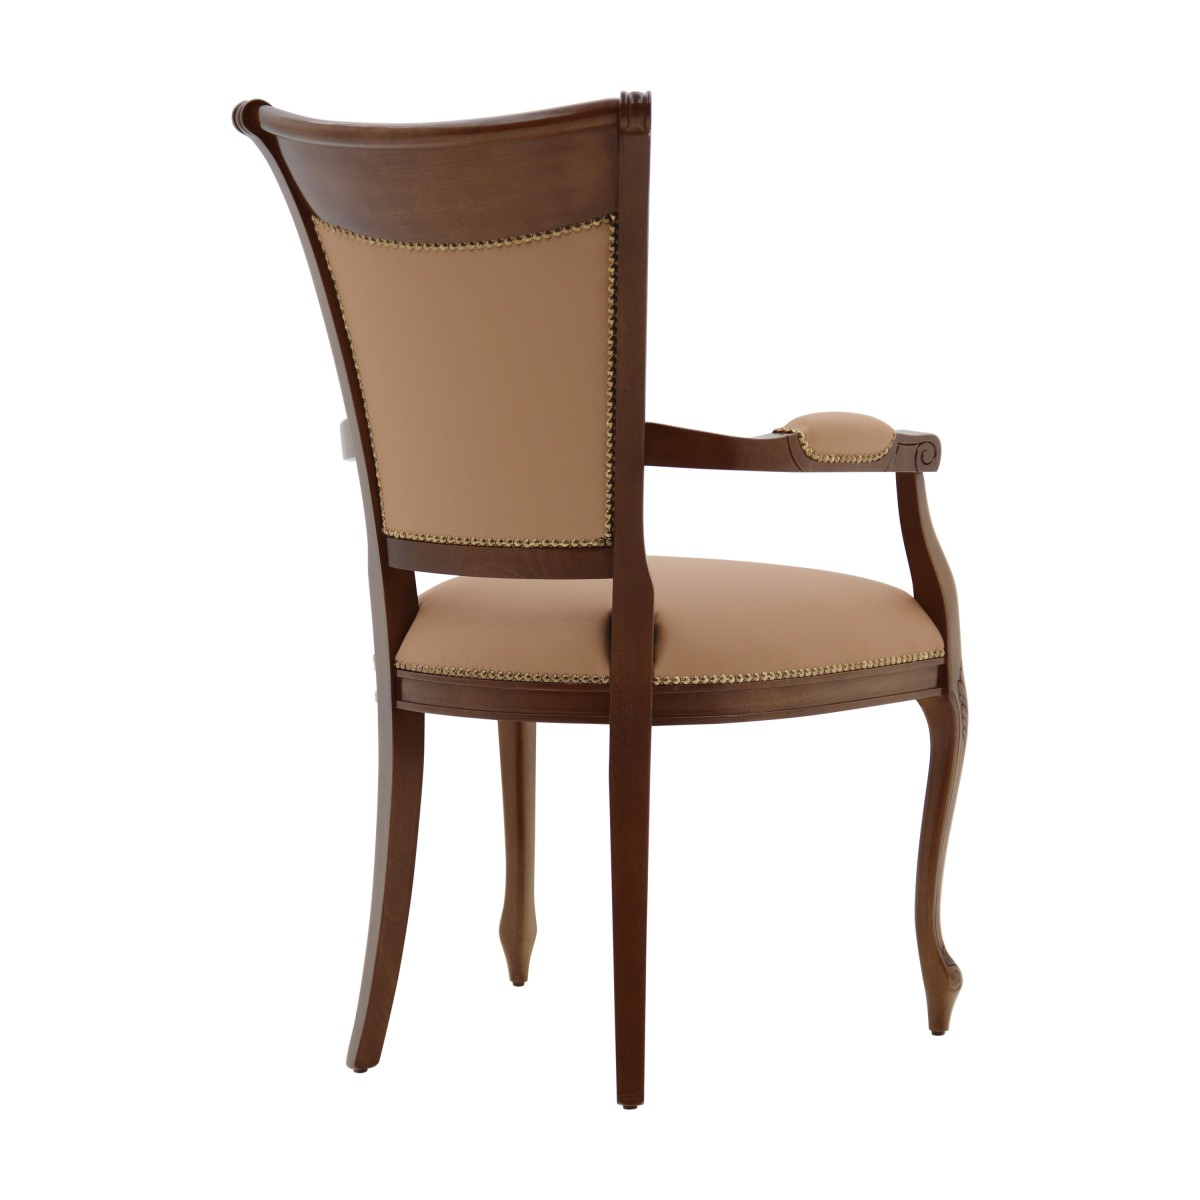 Small armchair Jersey - Sevensedie